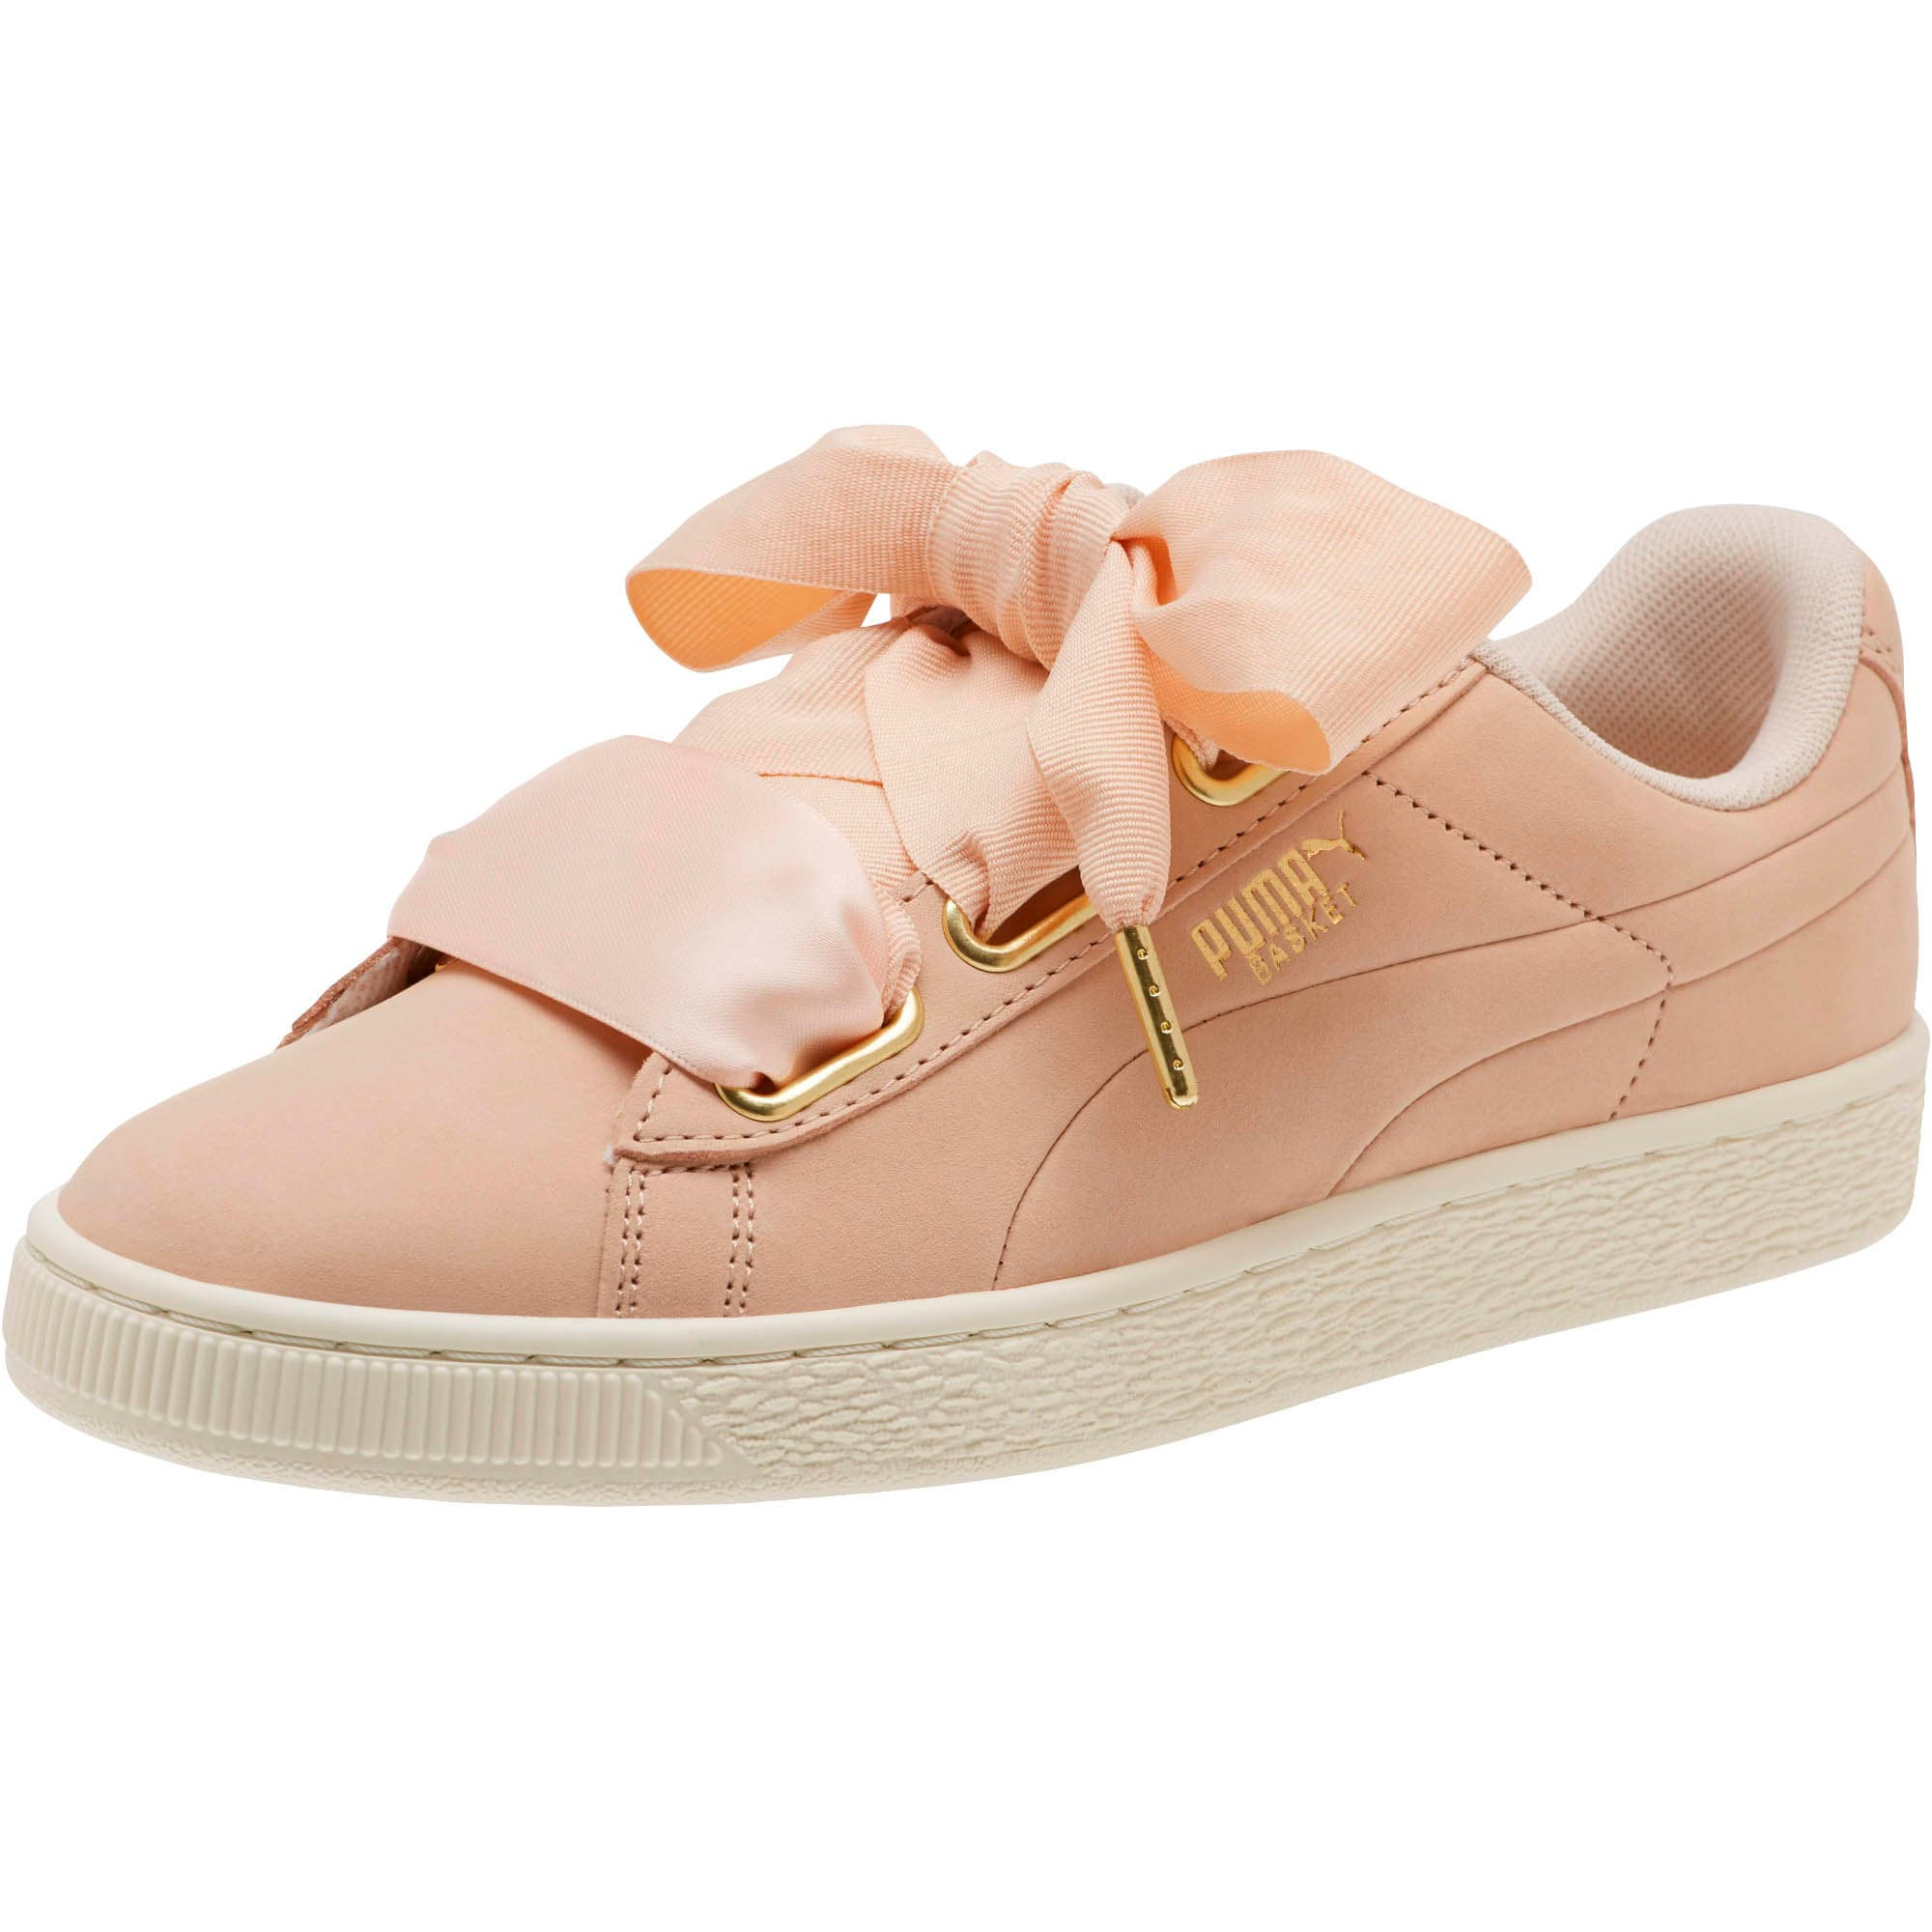 Thumbnail 1 of Basket Heart Soft Women's Sneakers, Cream Tan-Marshmallow, medium